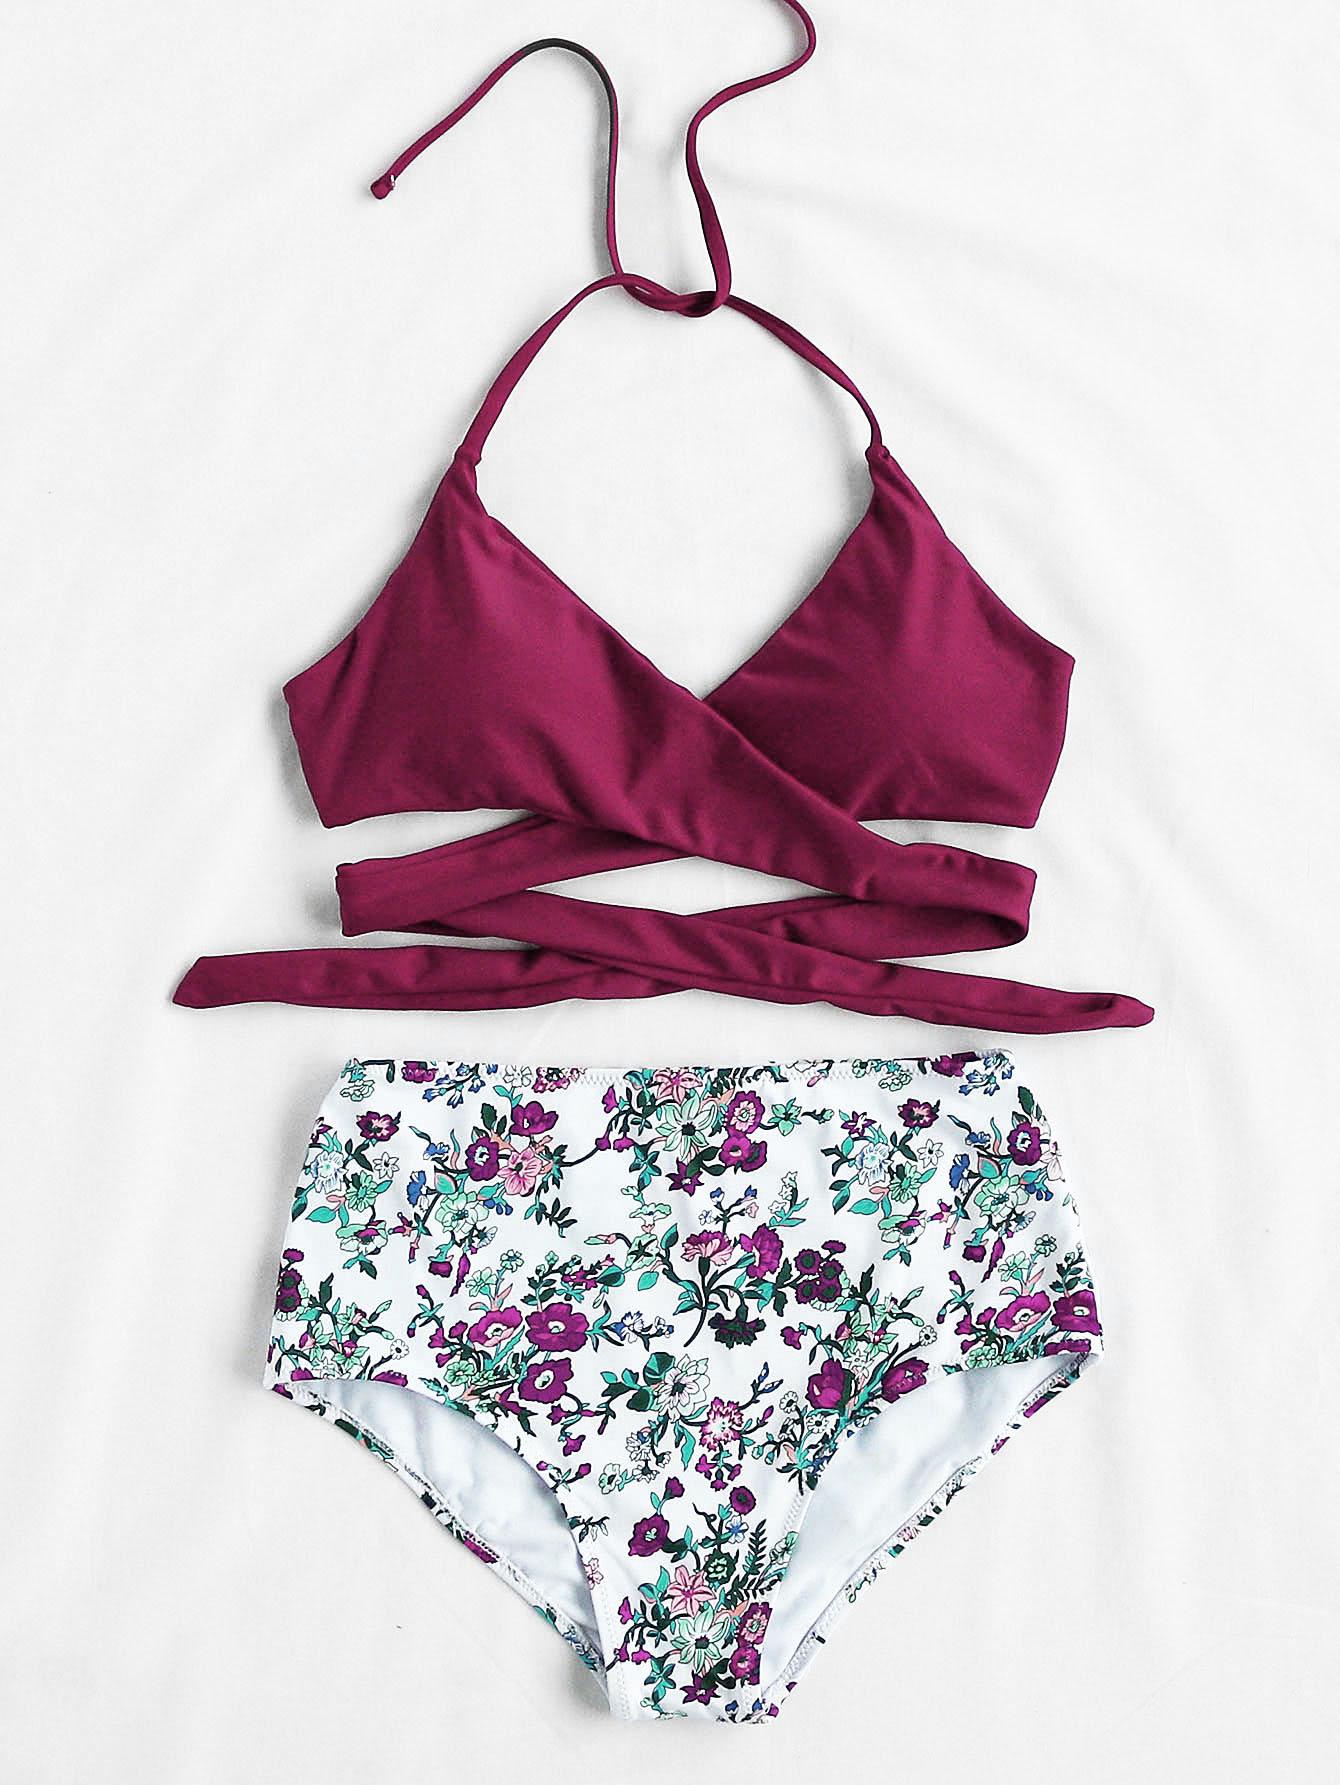 Calico Print High Waist Wrap Bikini Set